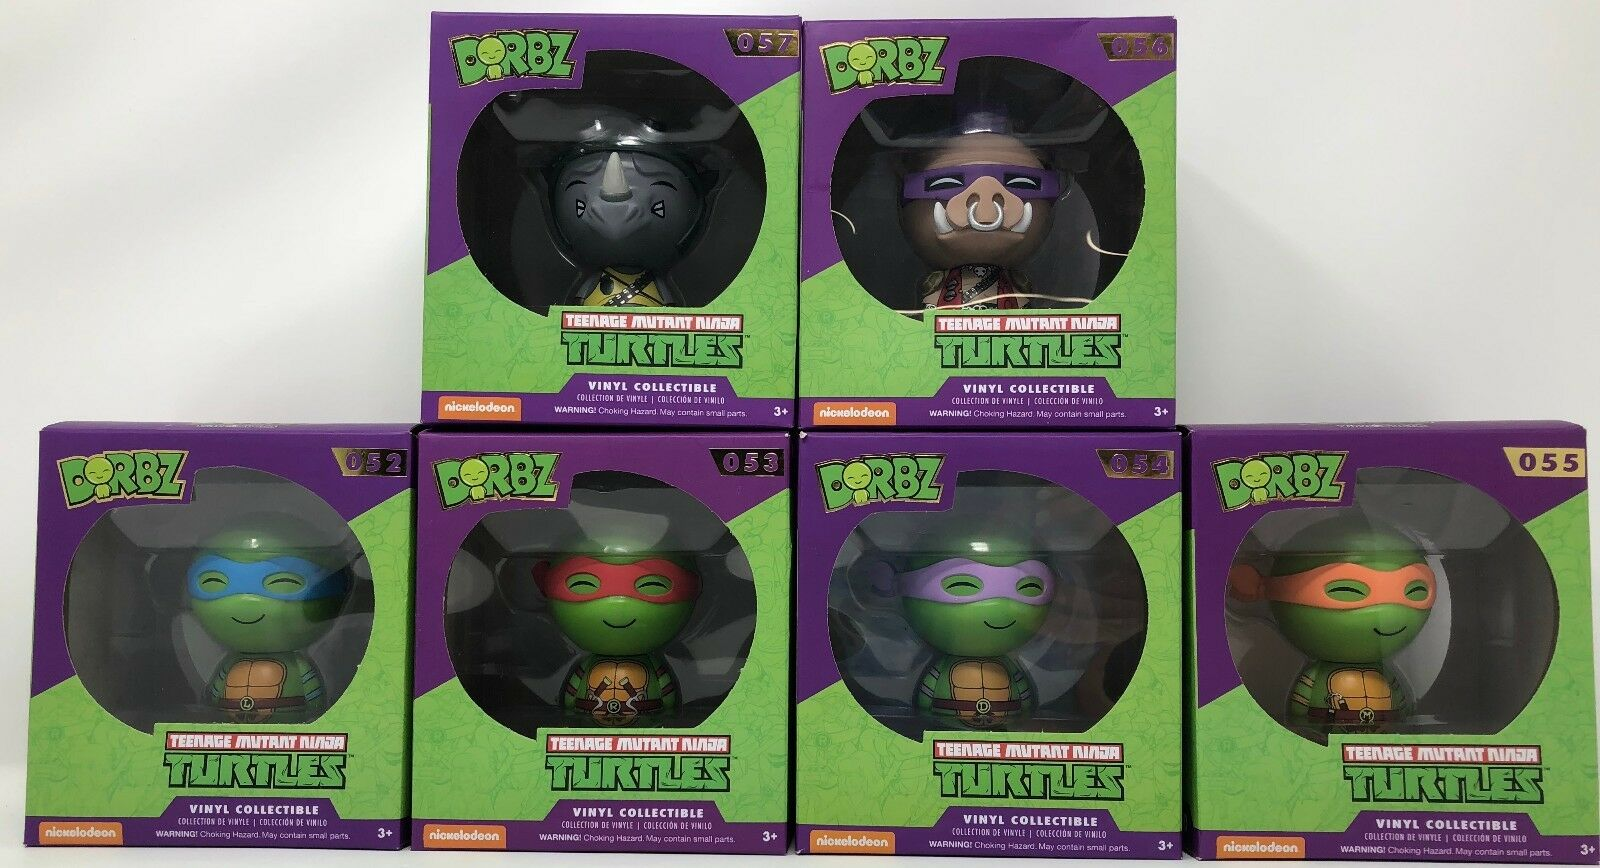 Dorbz Teenage Mutant Ninja Turtles Vinyl Sugar Collectibles 6 Bundle Set